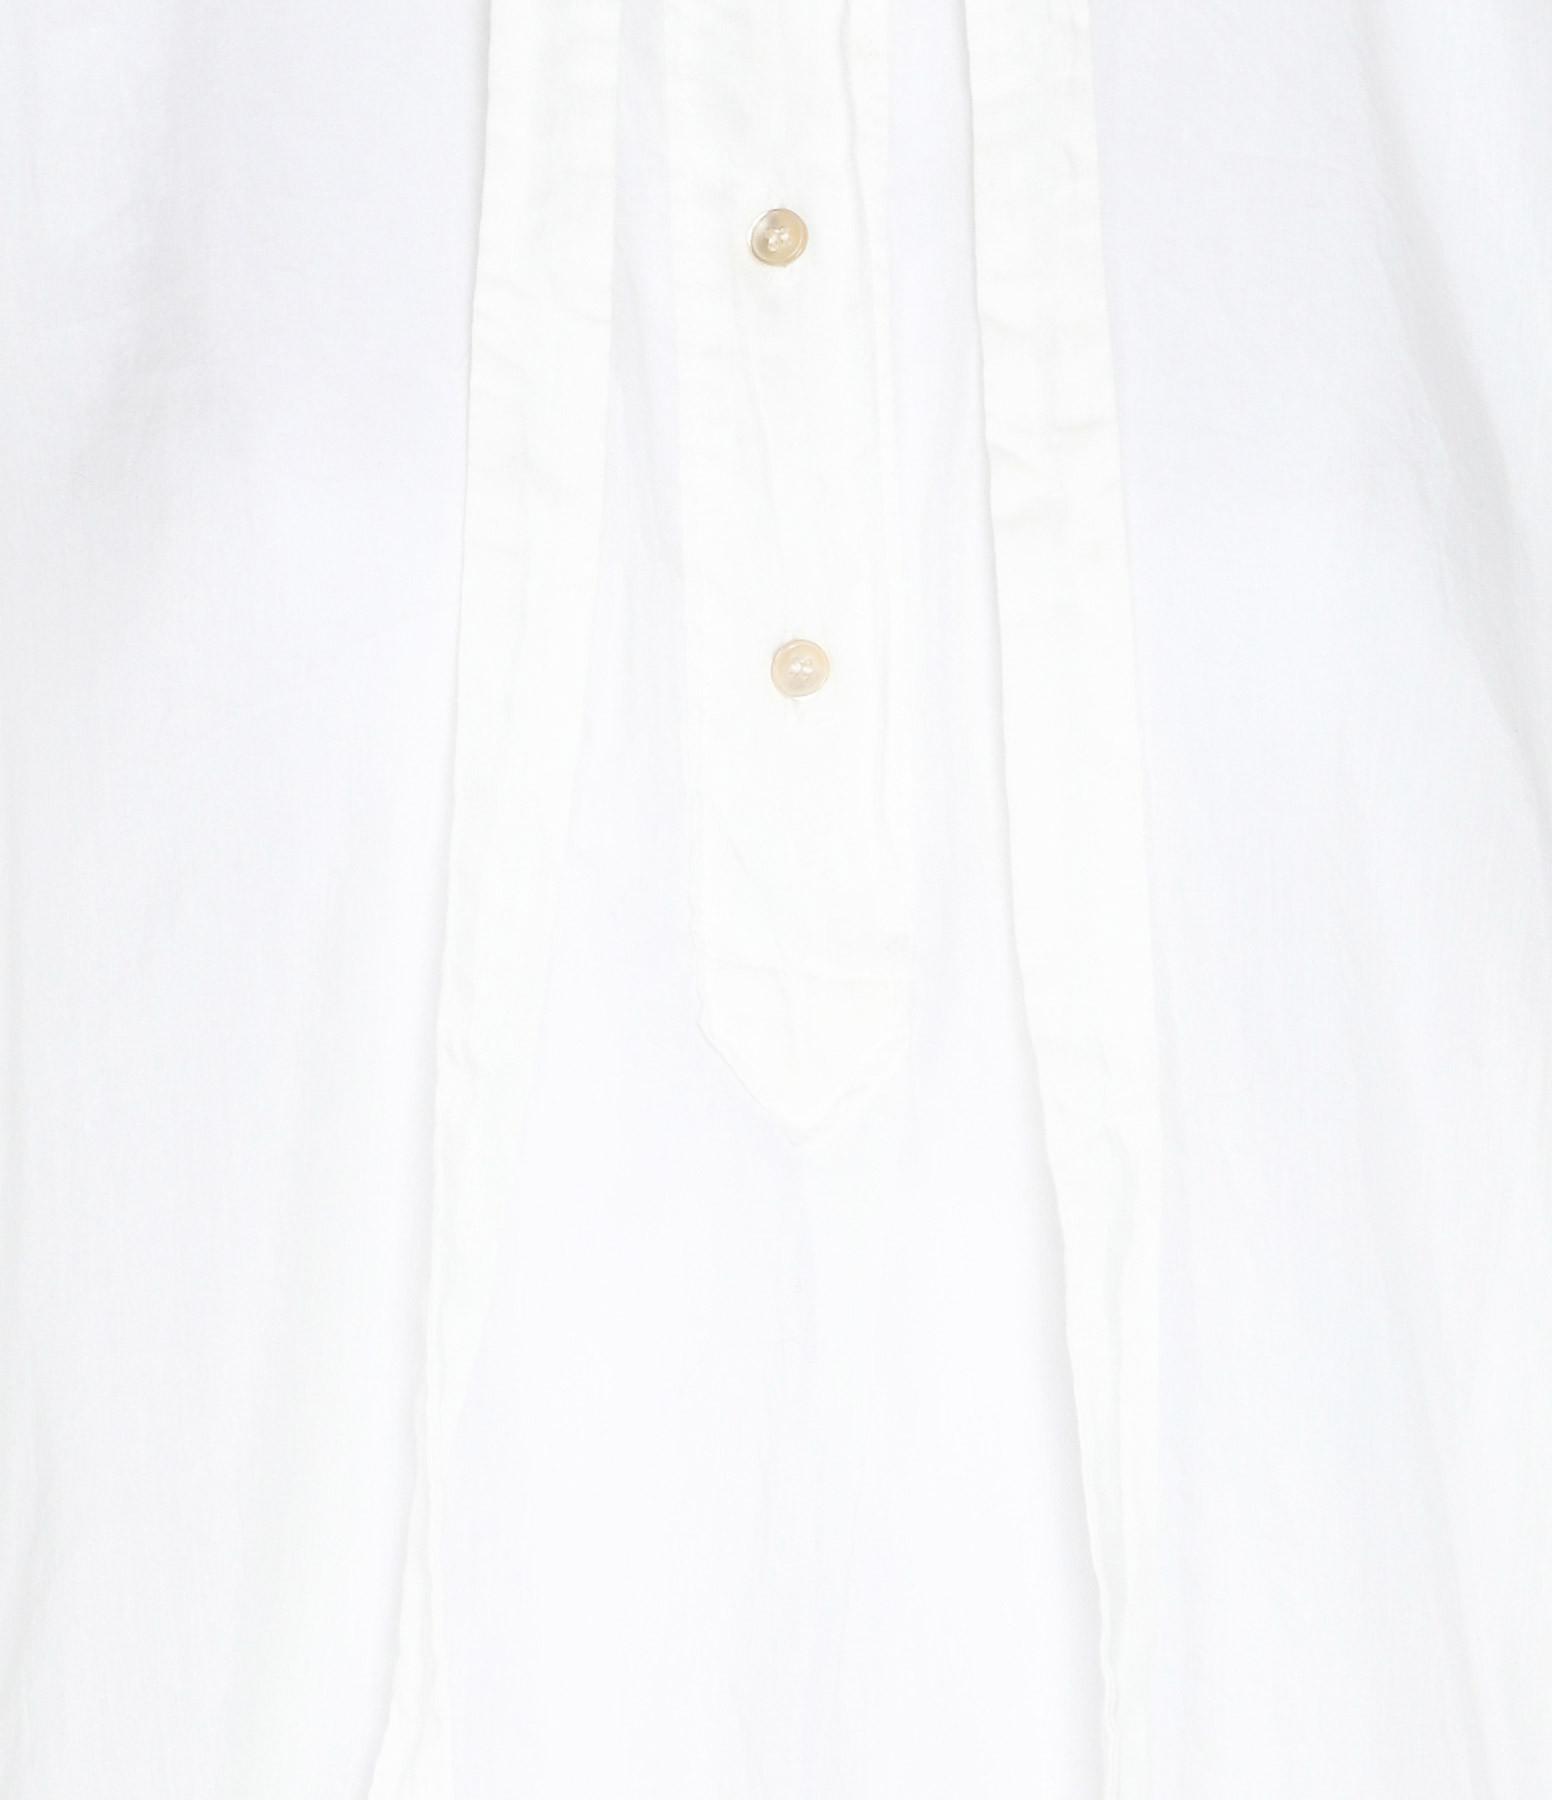 FORTE_FORTE - Blouse Ruban Voile Blanc Neige